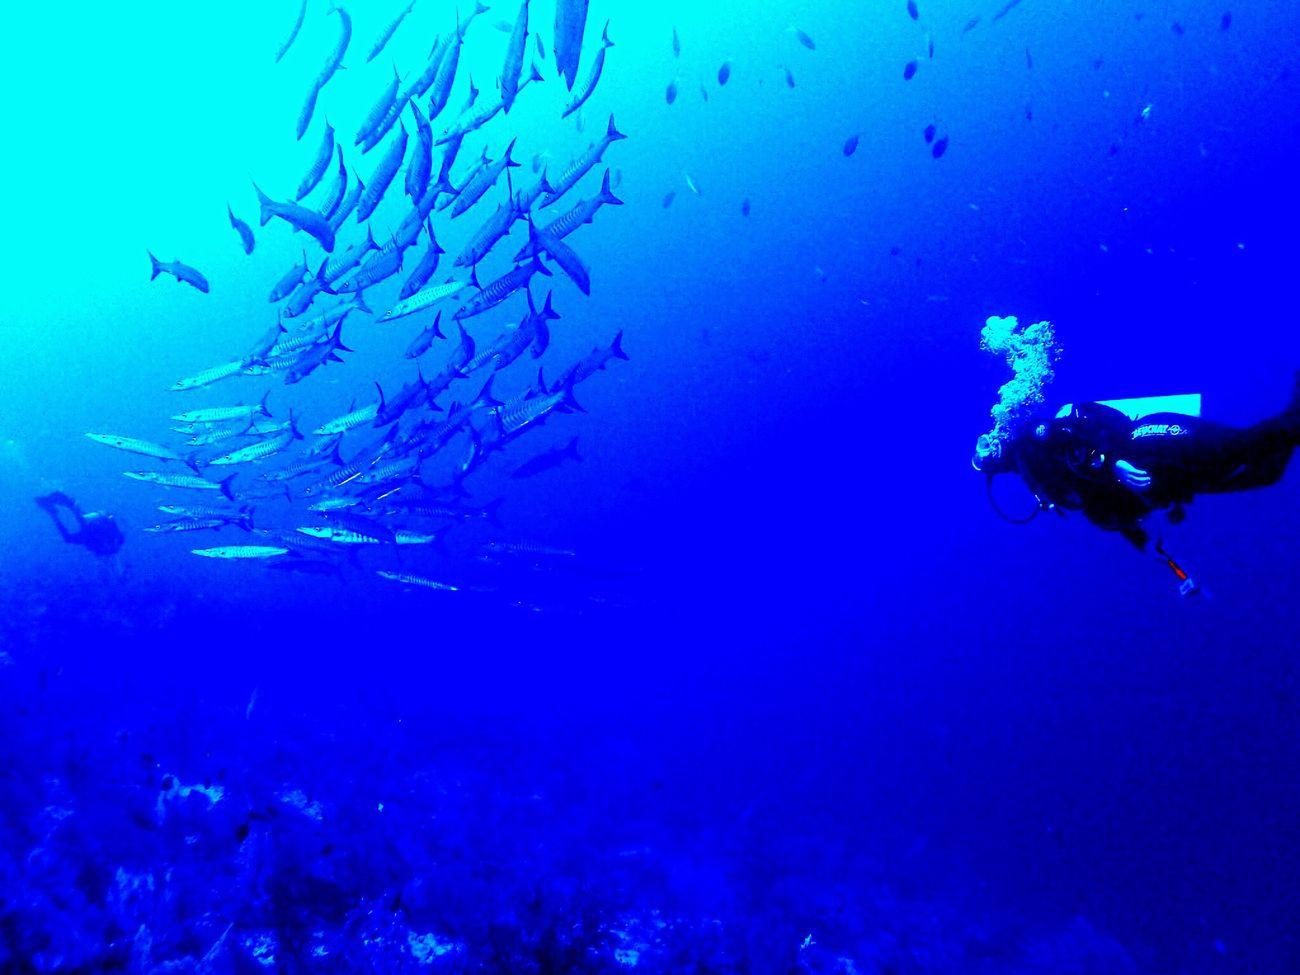 Deep Blue! ⛵️⚓️⚓️⛵️ That's Me Scuba Diving Divelandscape Rajaampat Barracuda school Blue Wave